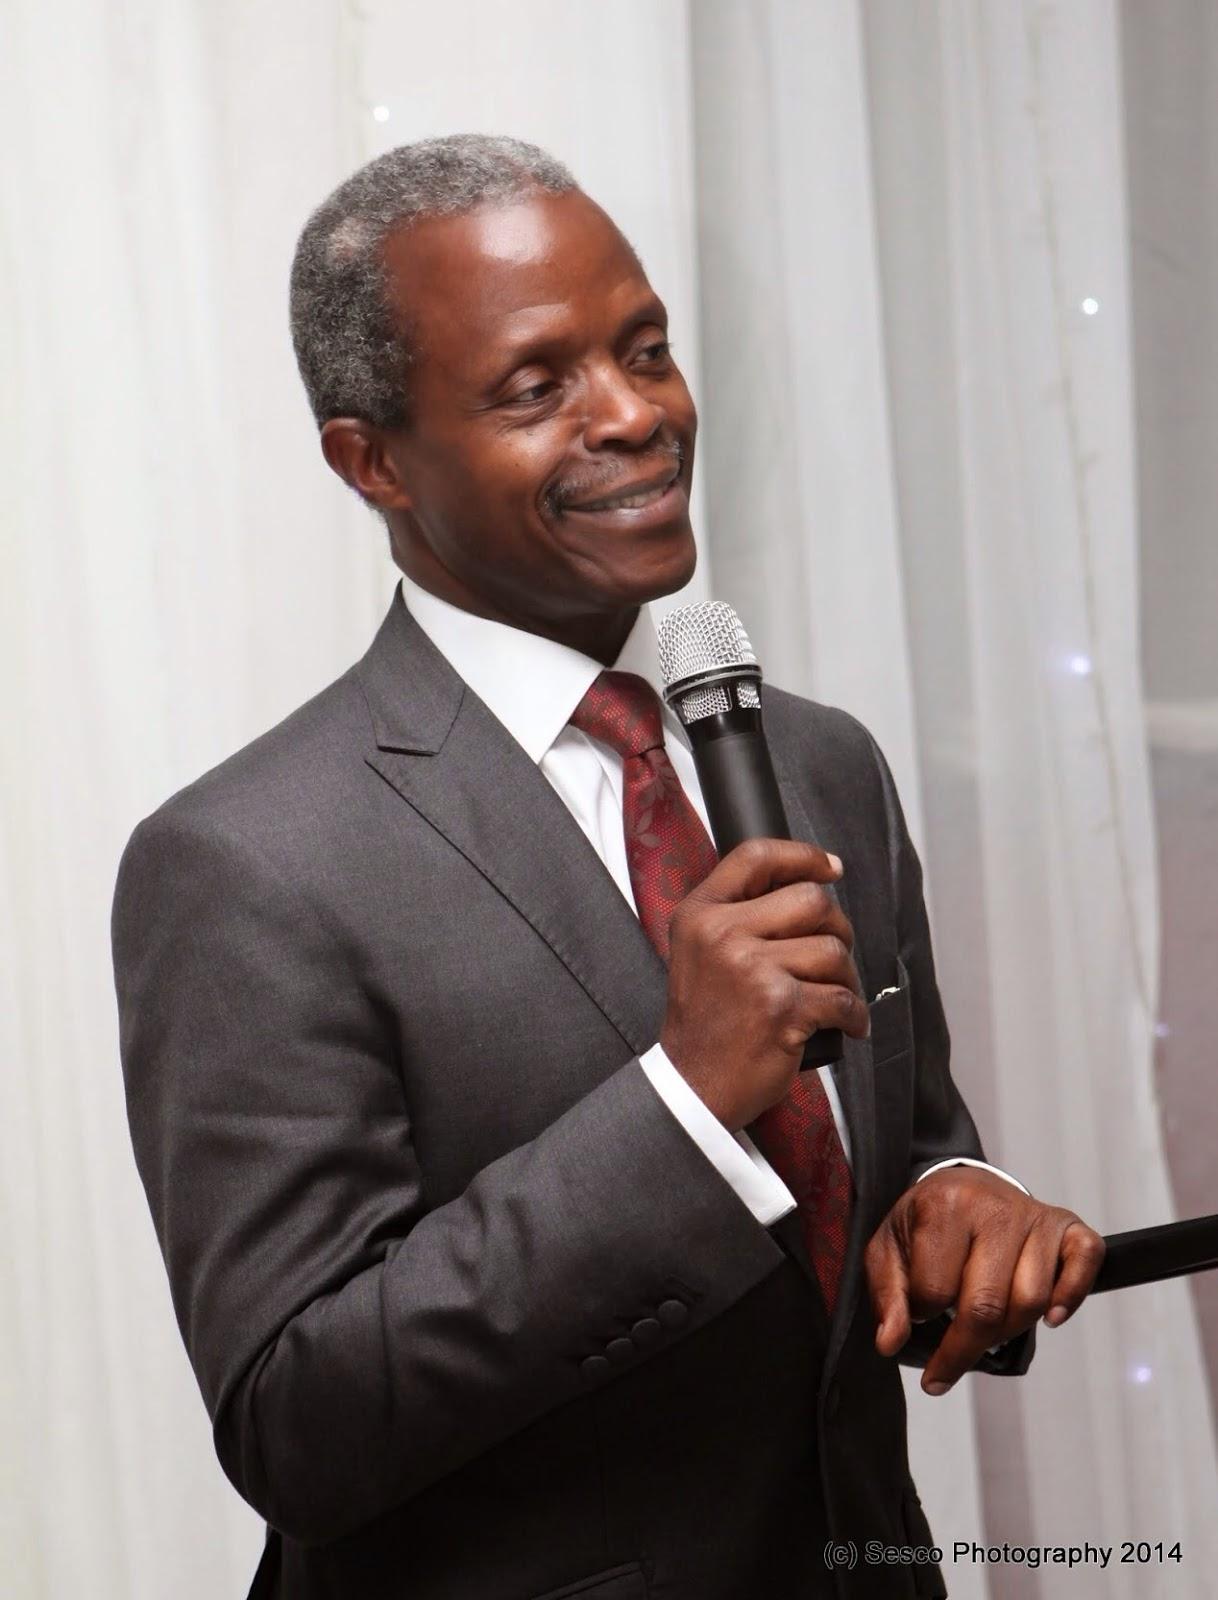 Nigeria's VP To Speak On Cooperation To The Digital Age